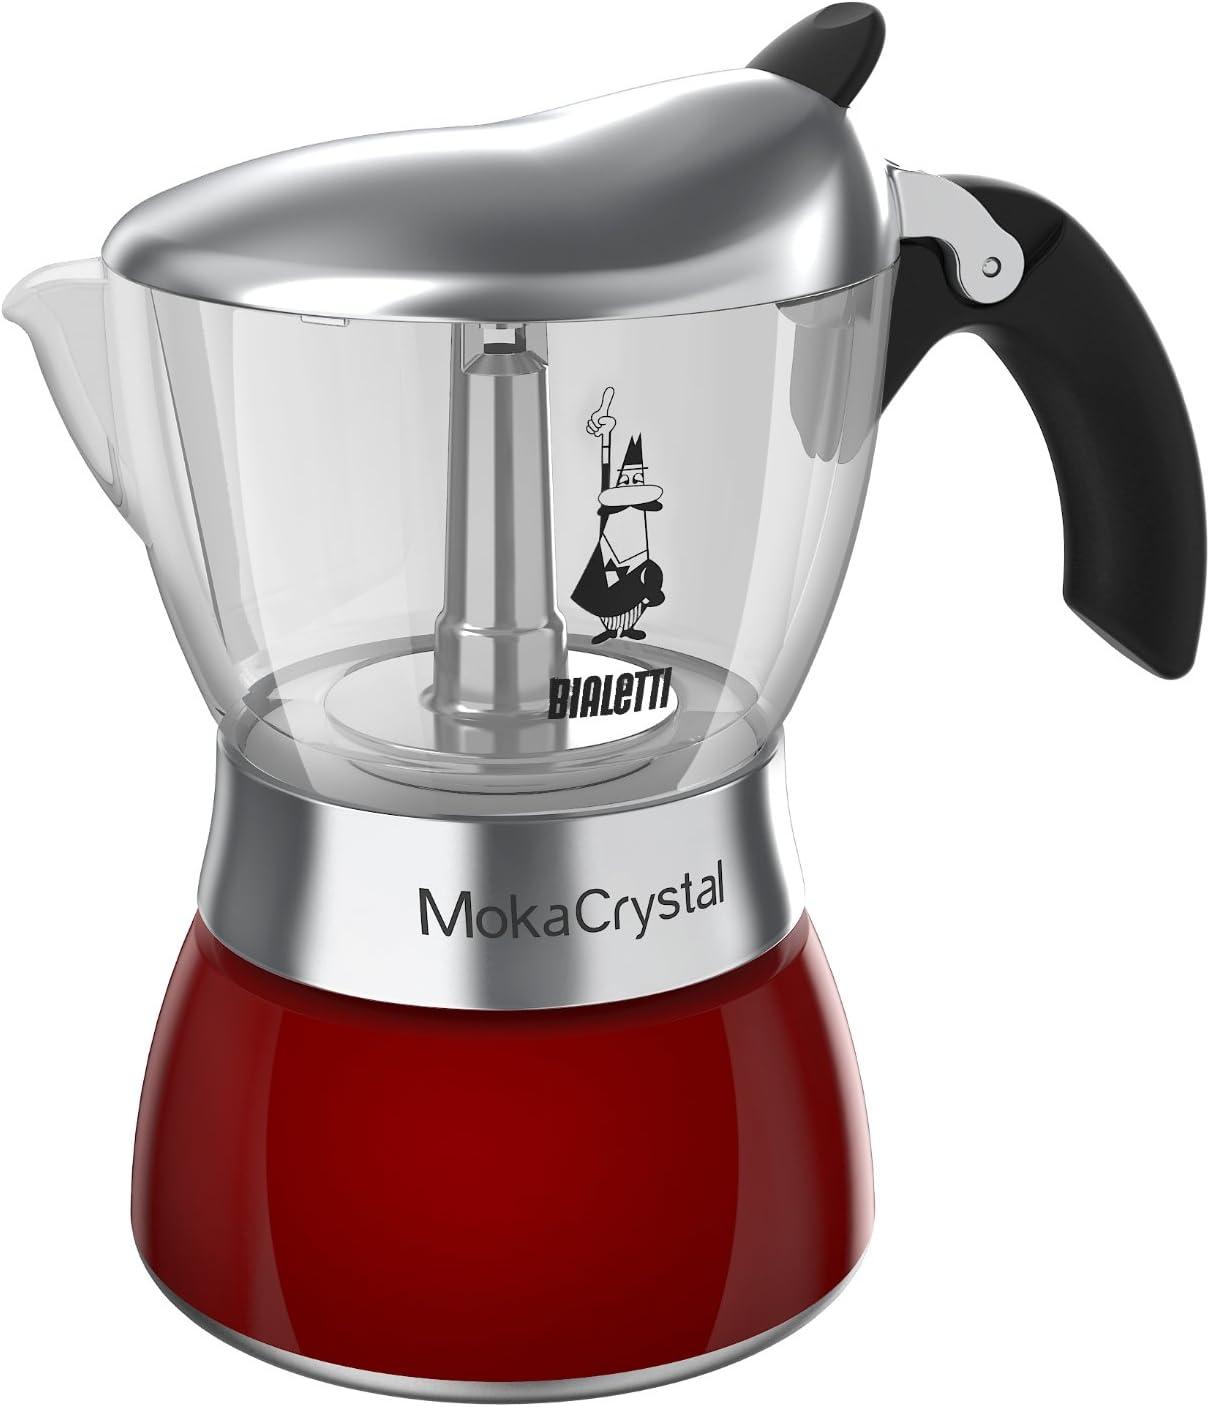 Bialetti Moka de Cristal 0004313 cafetera Italiana para 6 Tazas Rojo: Amazon.es: Hogar